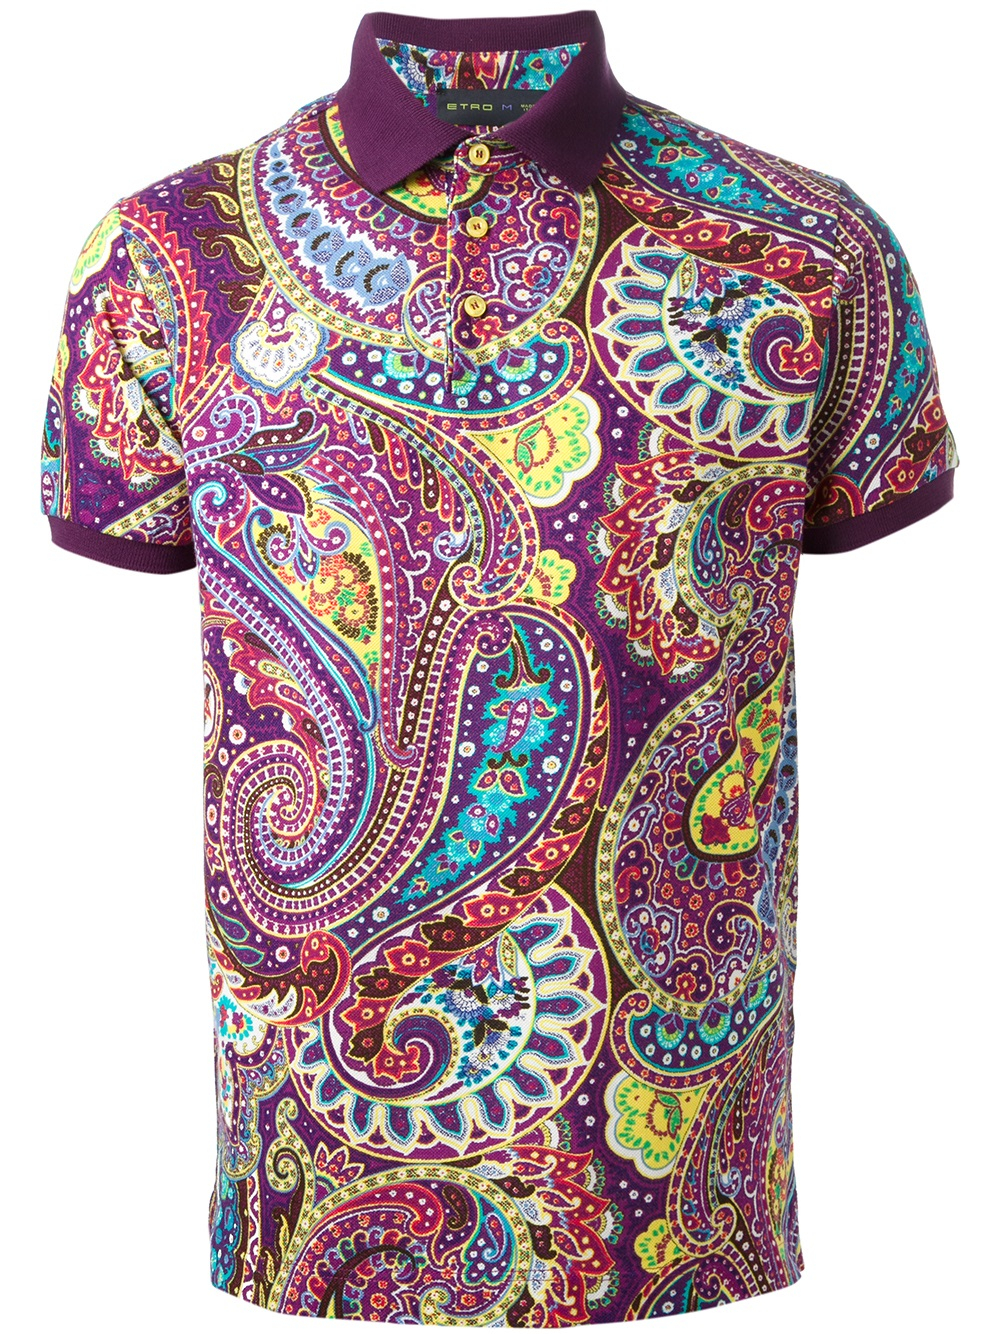 Burberry Polo Shirt For Women